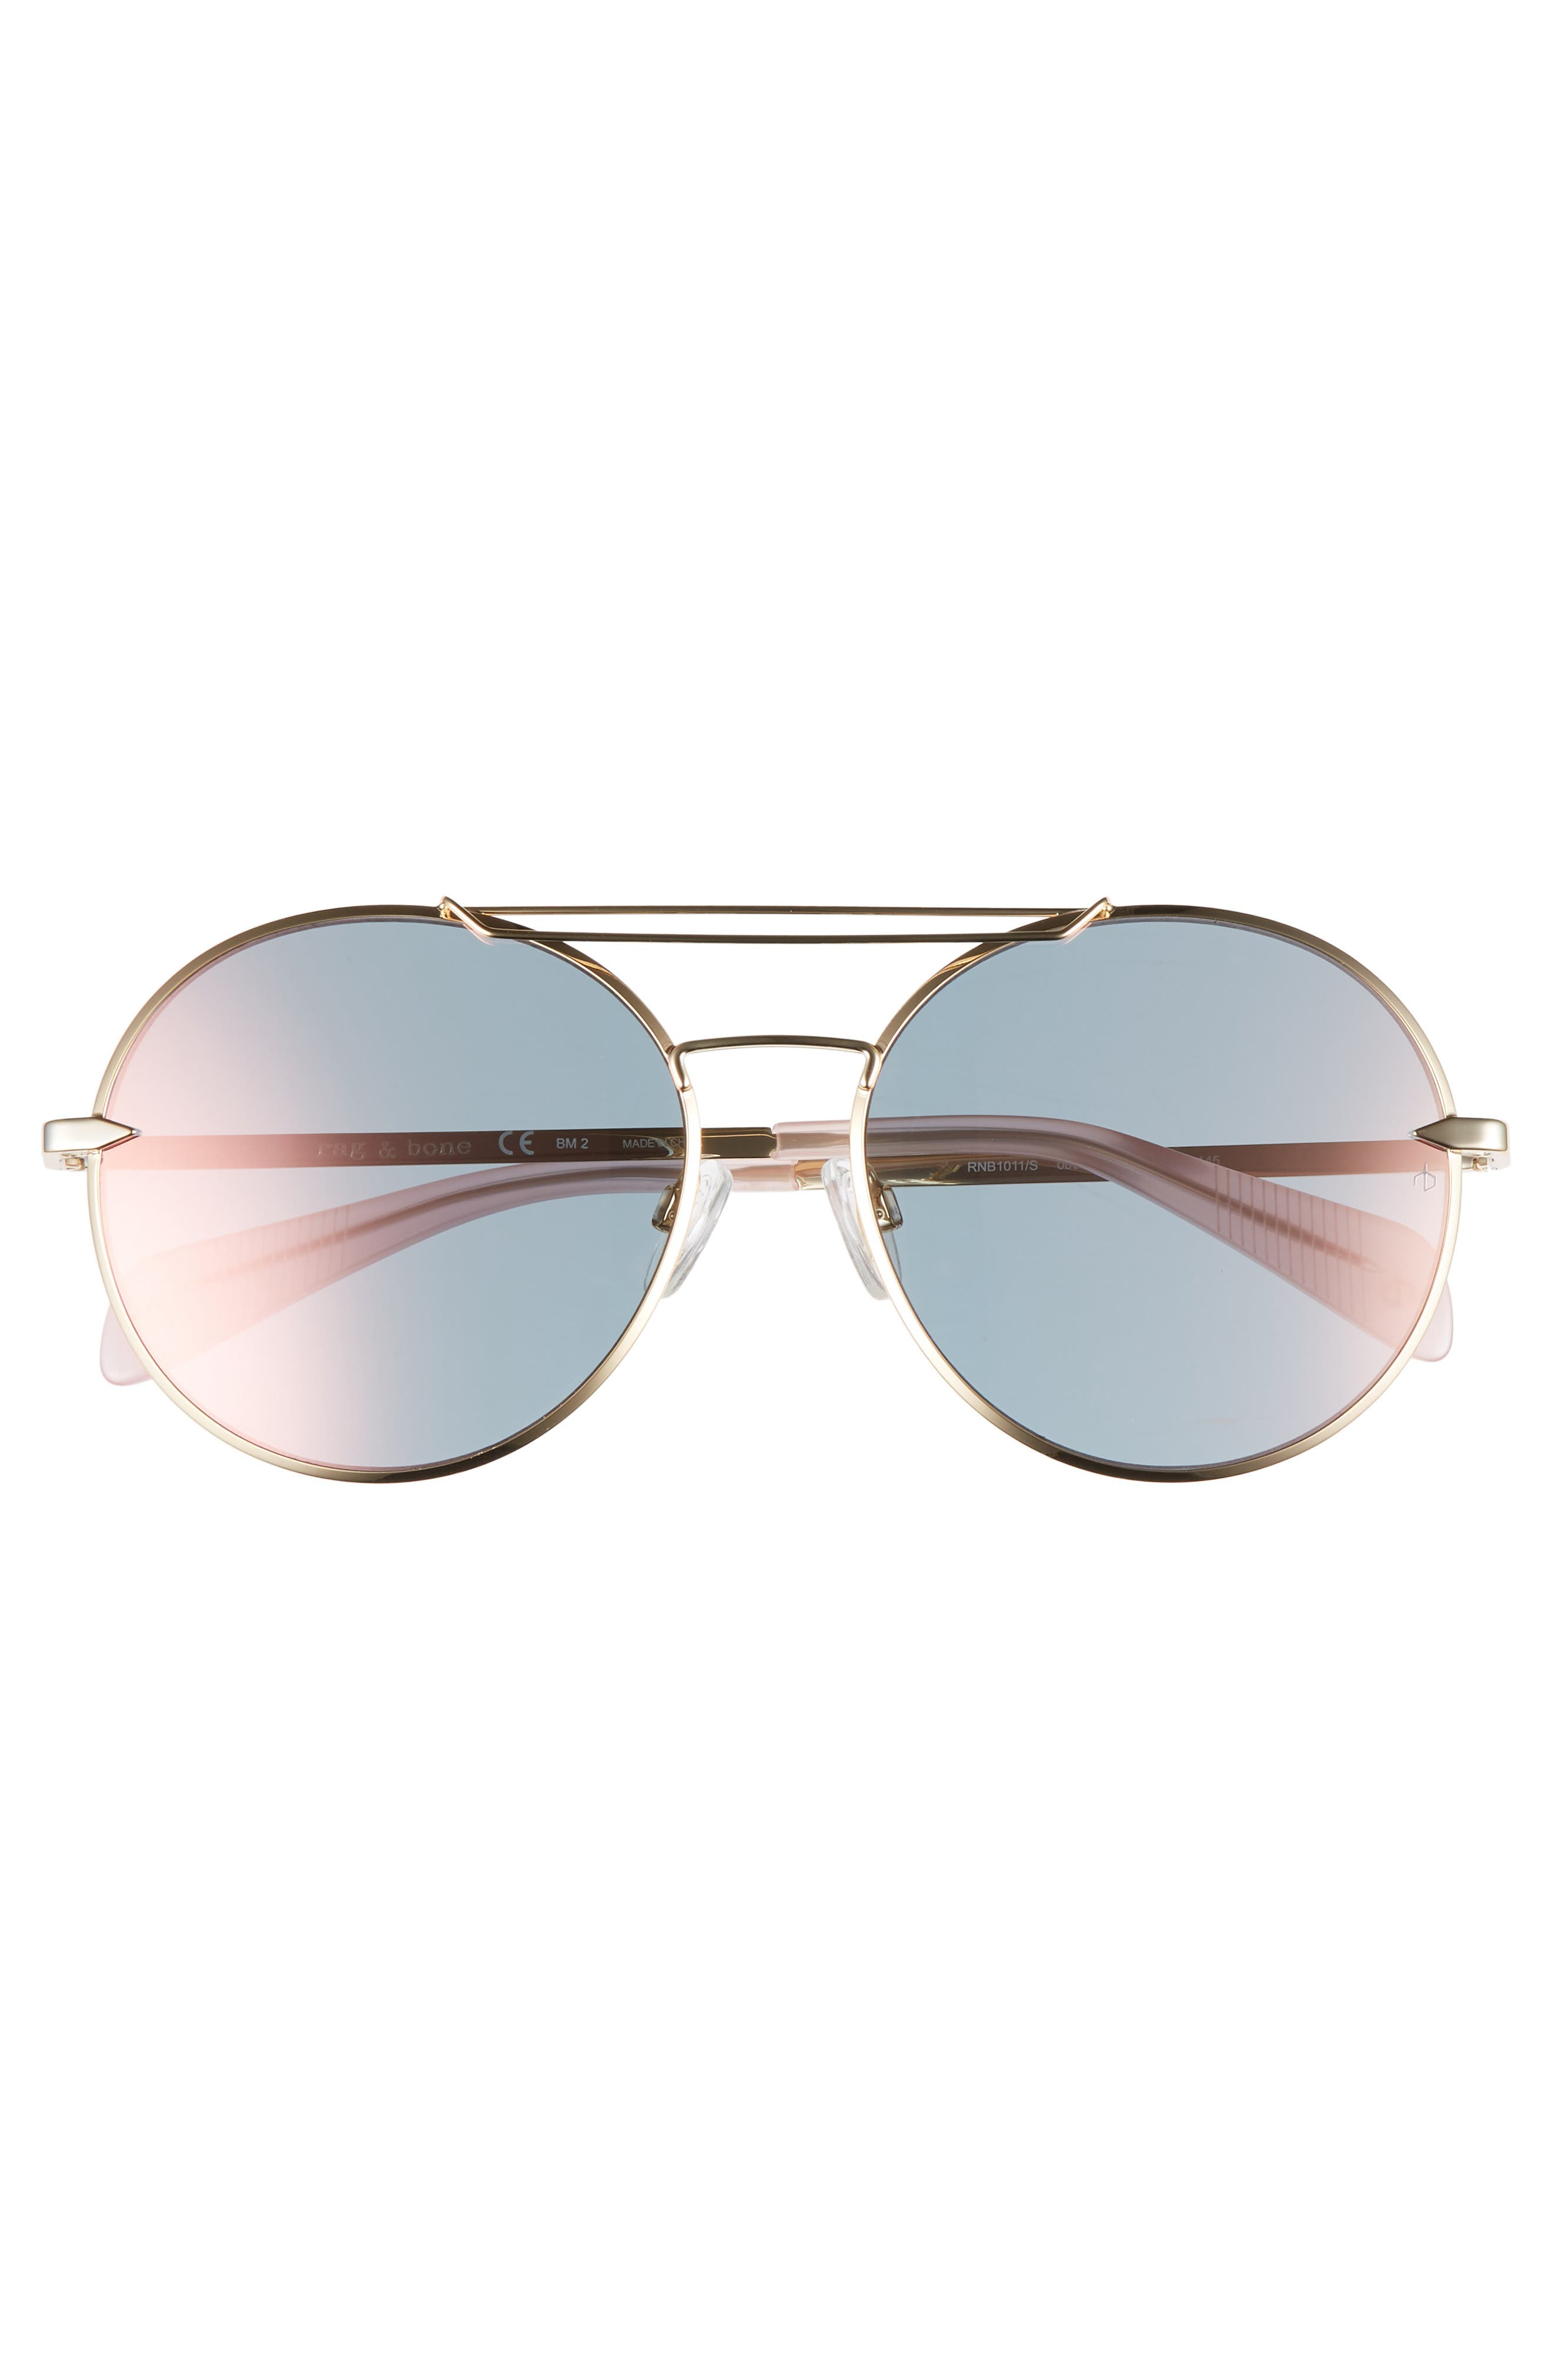 59mm Round Metal Aviator Sunglasses,                             Alternate thumbnail 3, color,                             ROSE GOLD